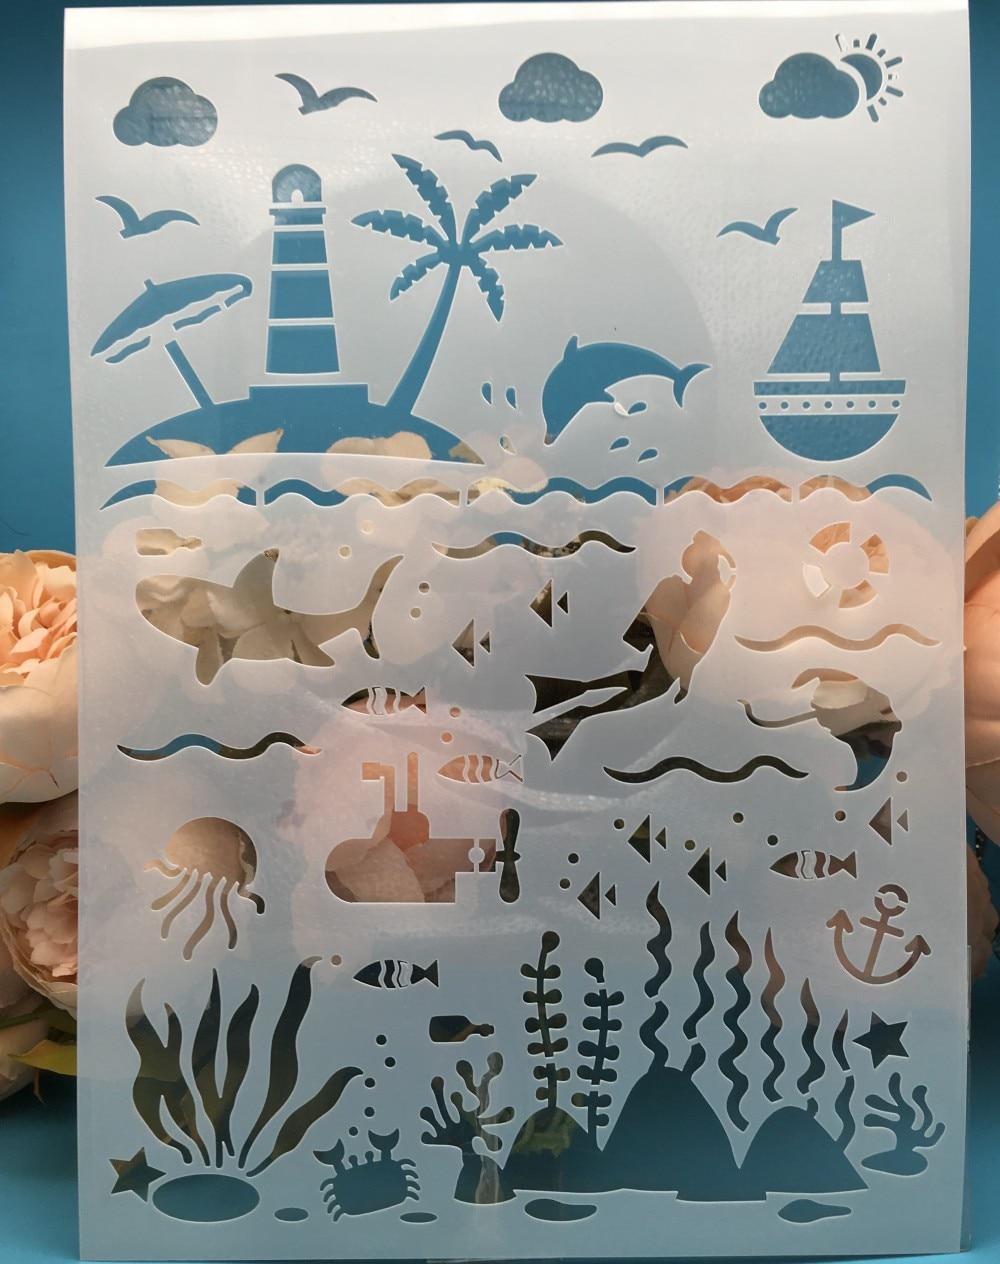 A4 Sea Ocean World DIY Layering Stencils Wall Painting Scrapbook Coloring Embossing Album Decorative Card Template